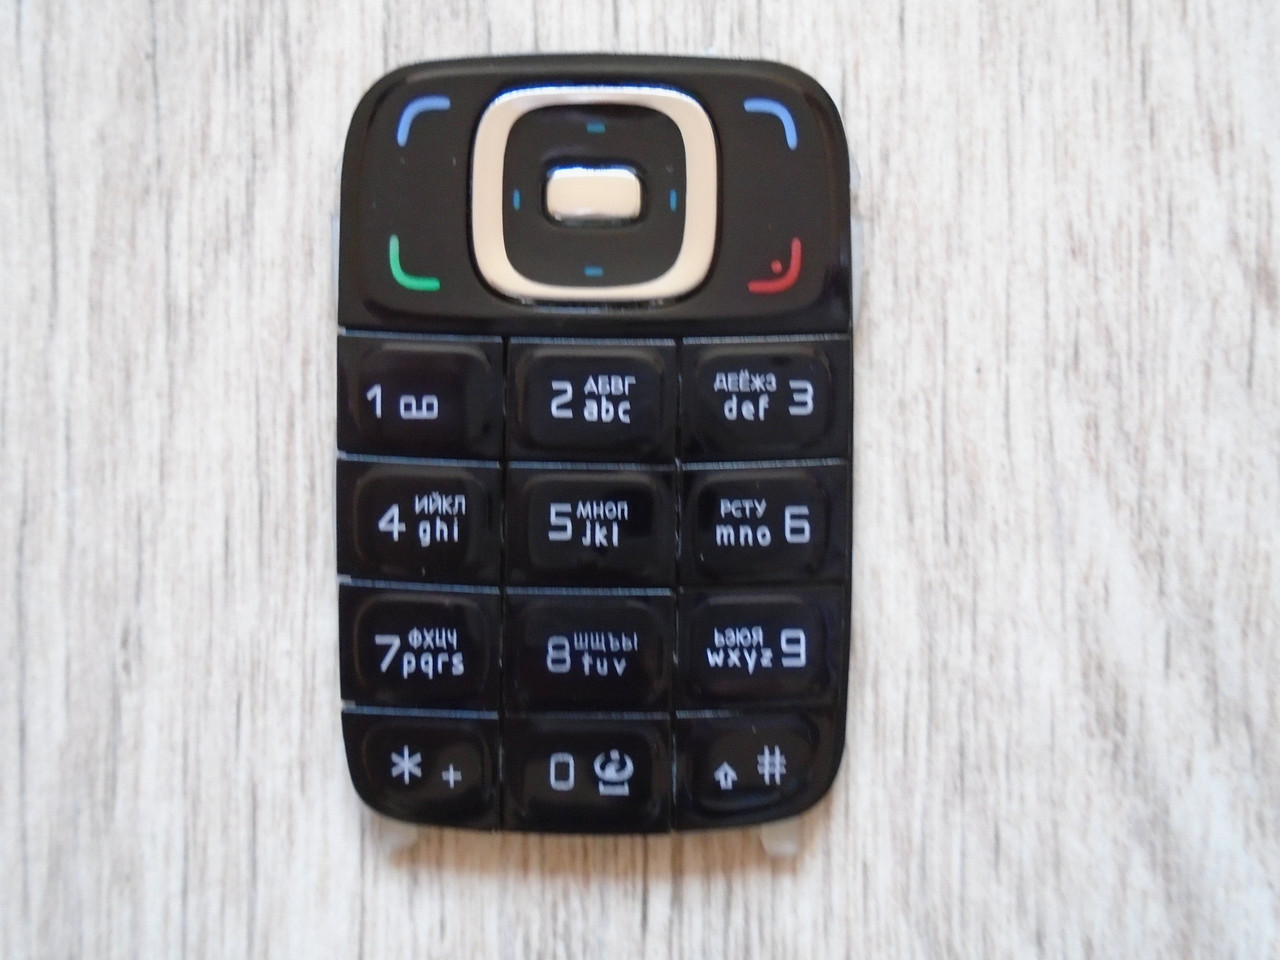 Клавиатура Nokia 6131 Black high copy